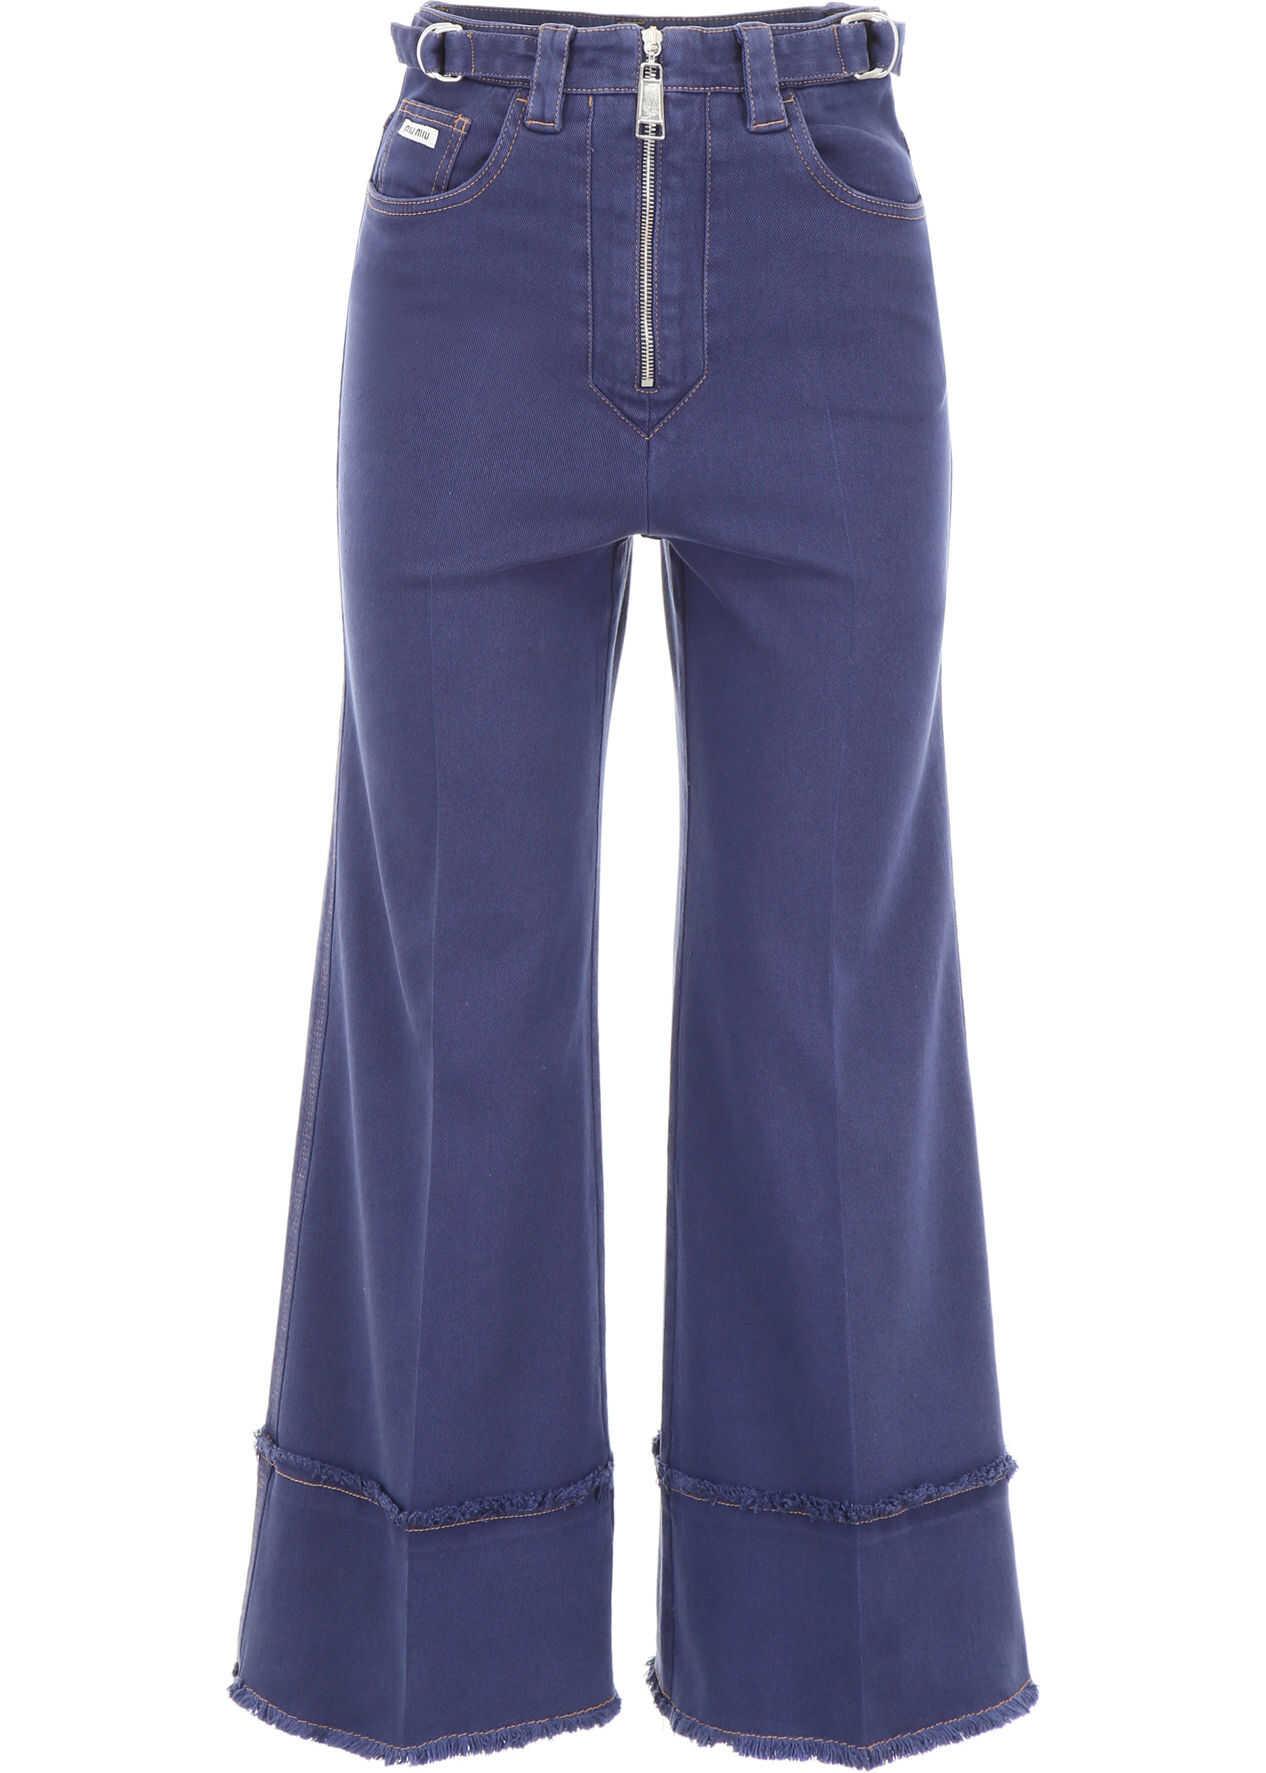 Miu Miu Oversized Jeans BALTICO